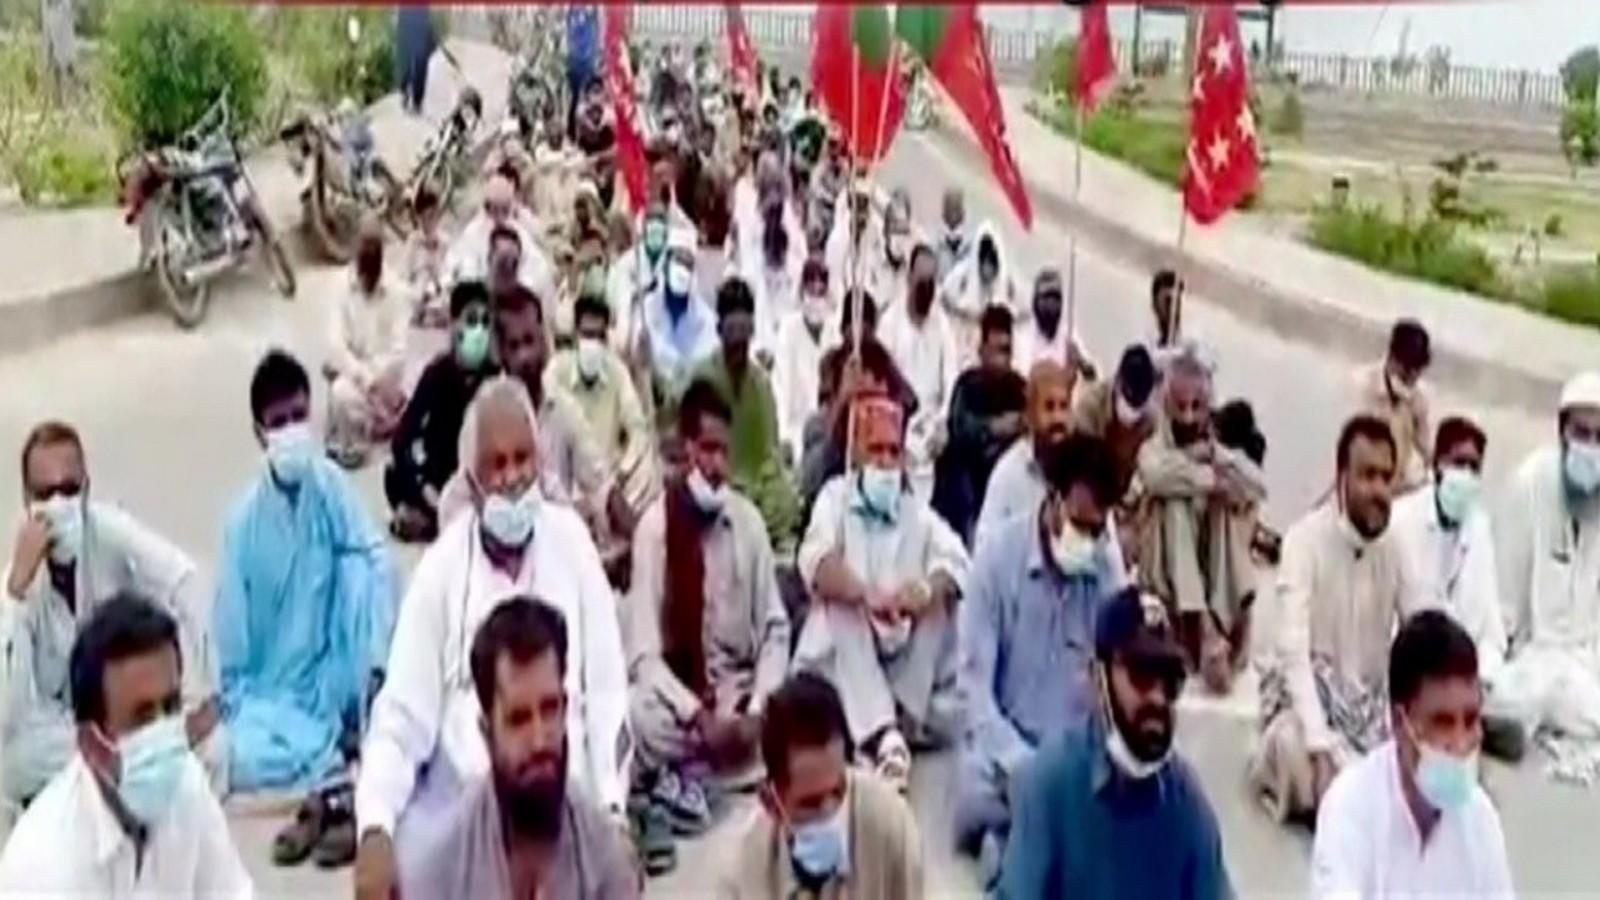 fishermen-lead-anti-pak-protests-in-balochistan-demand-rights-jobs